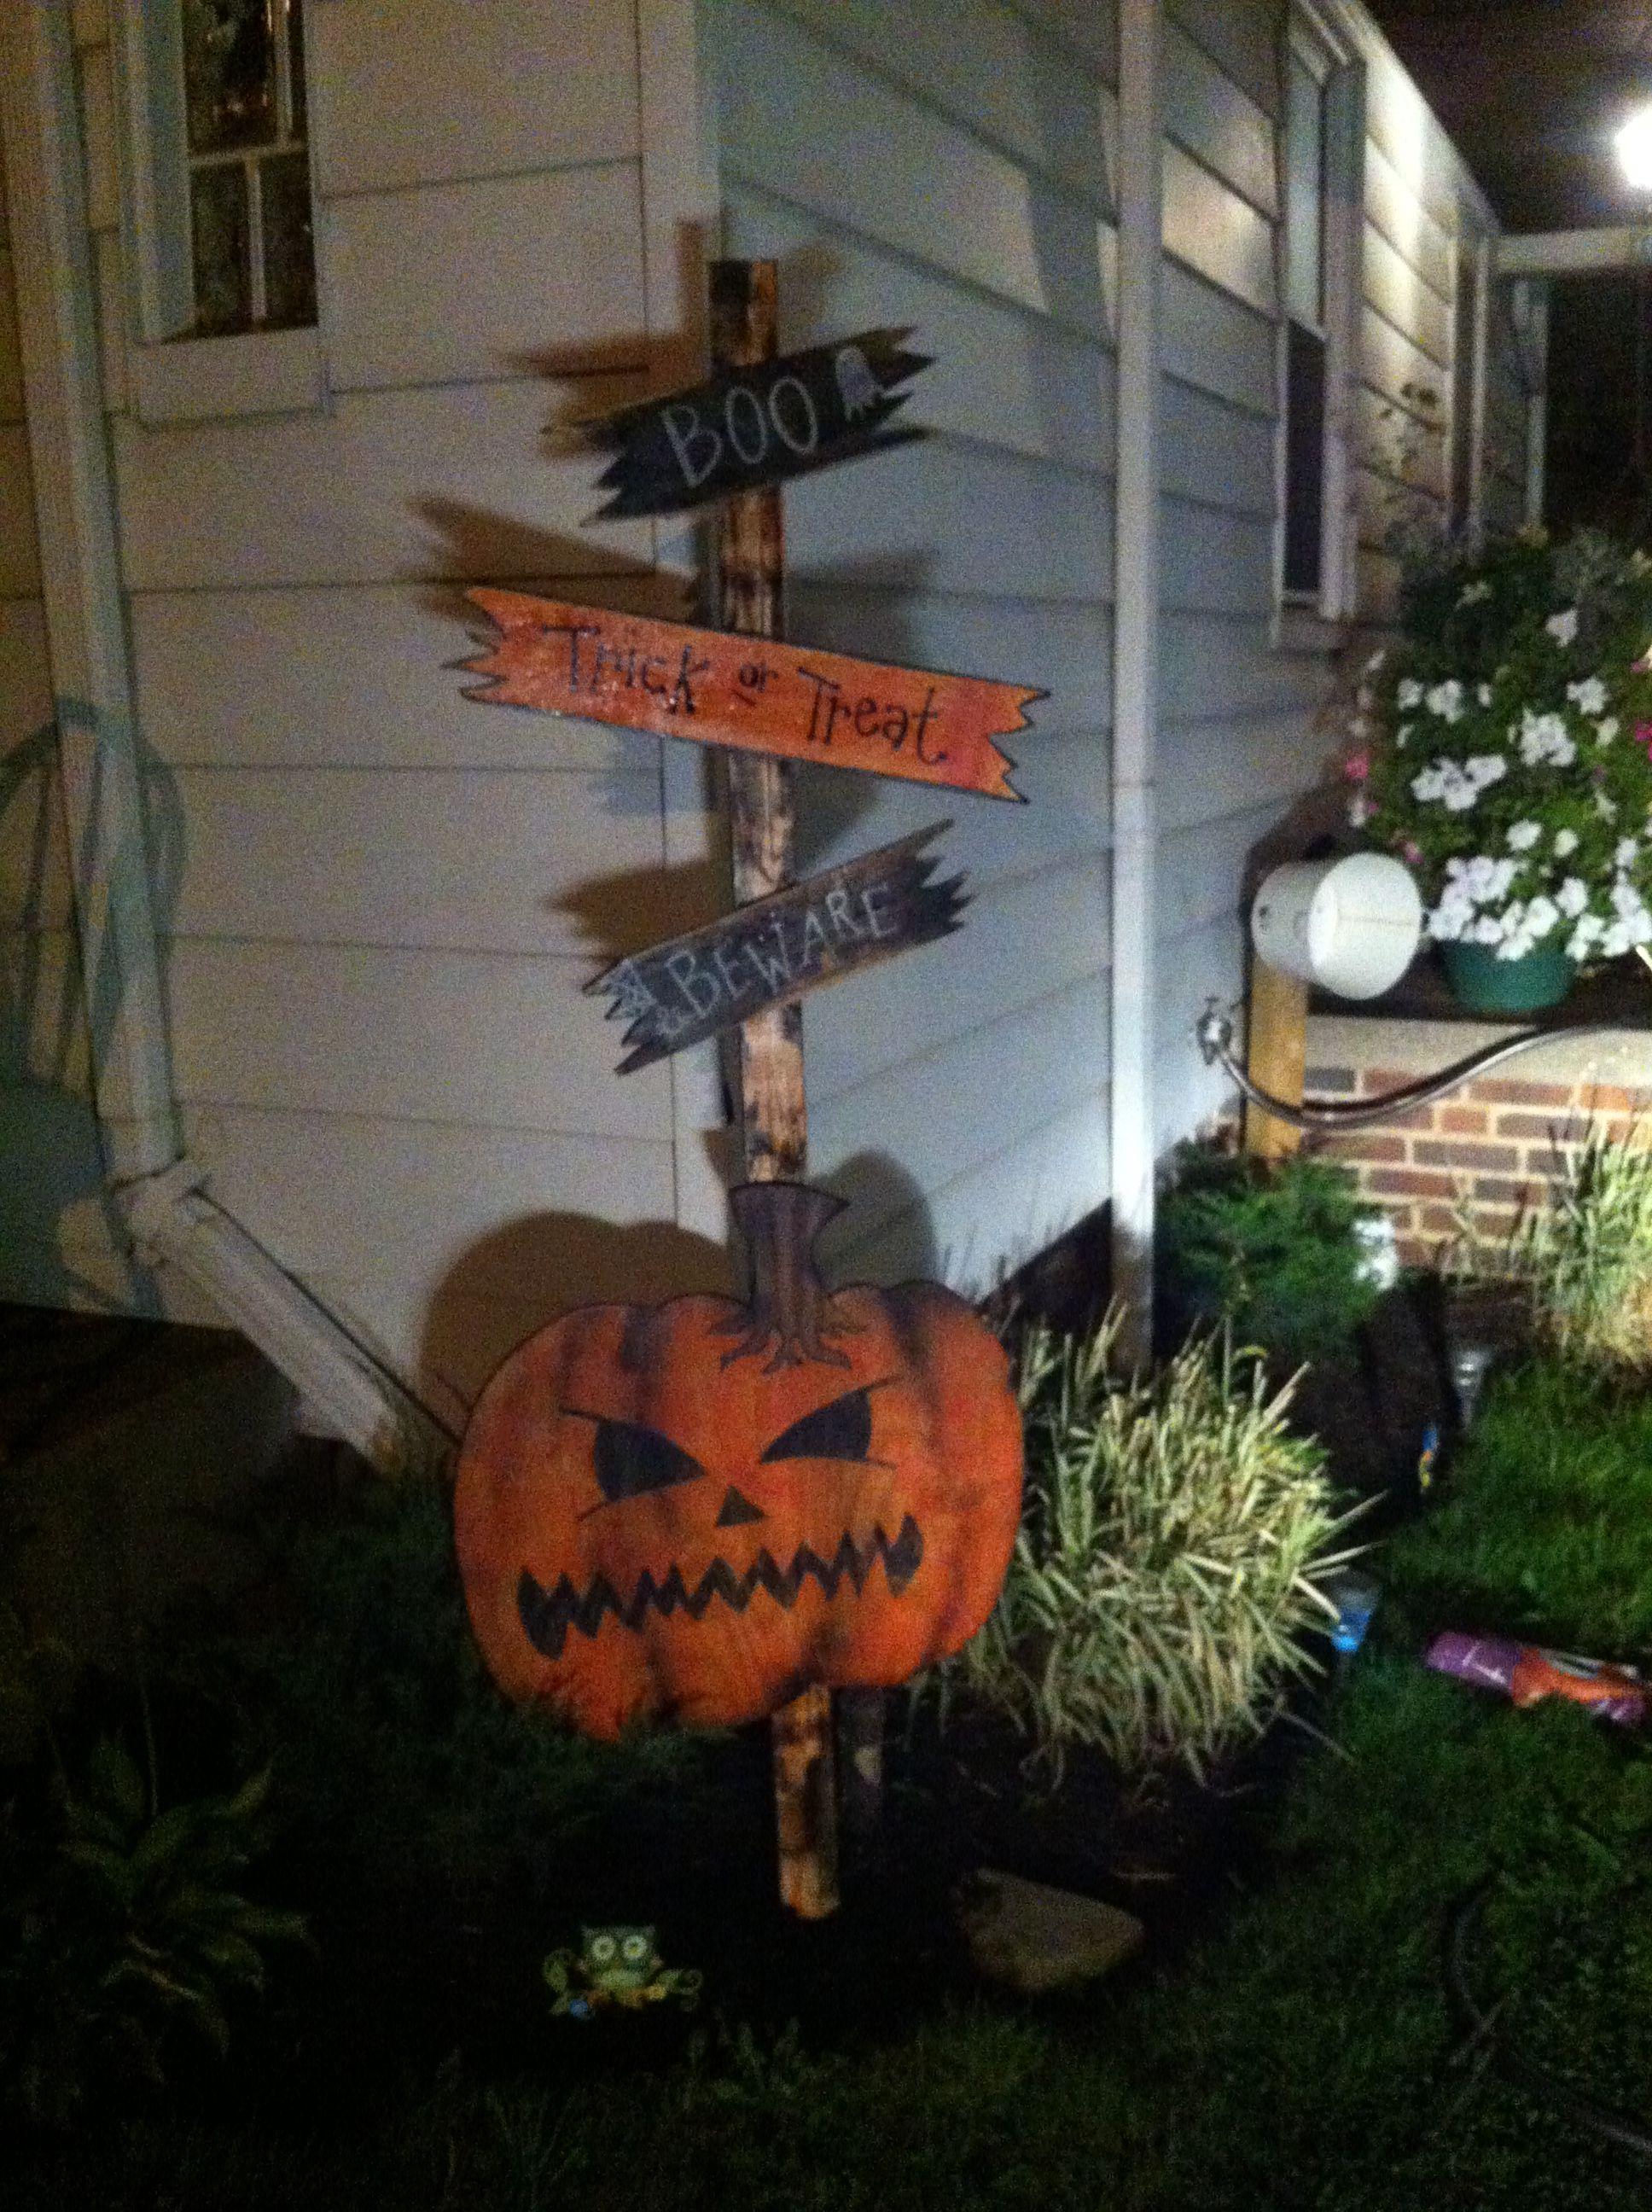 Diy Halloween Yard Signs Halloween Decorations Trick Or Treat Harvest Holidaydec Halloween Yard Decorations Halloween Yard Signs Halloween Crafts Decorations